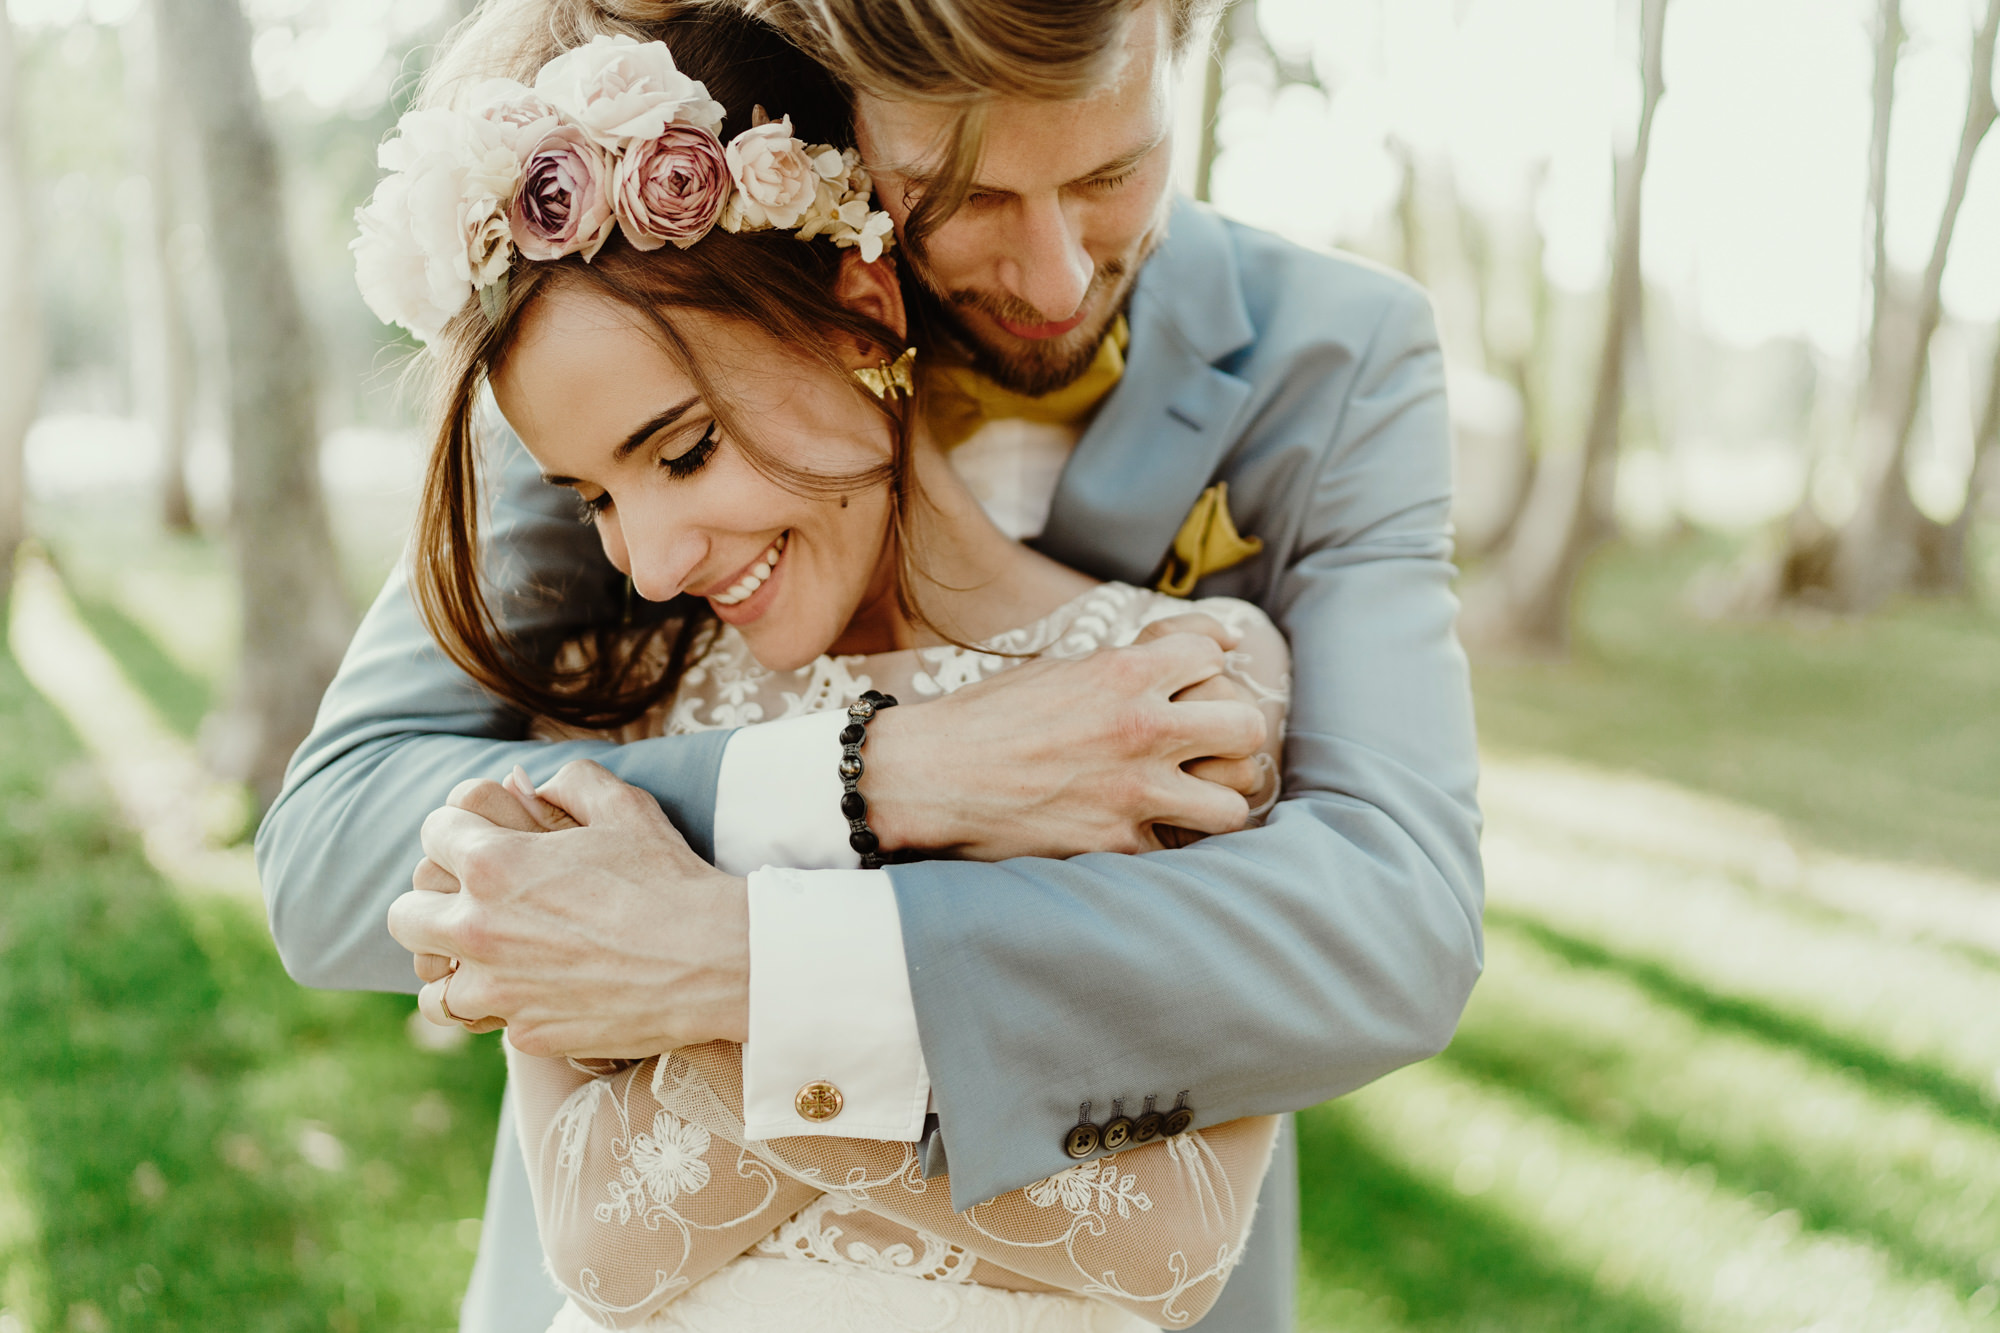 Sweet portrait of groom and bride in rose floral crown by Fer Juaristi